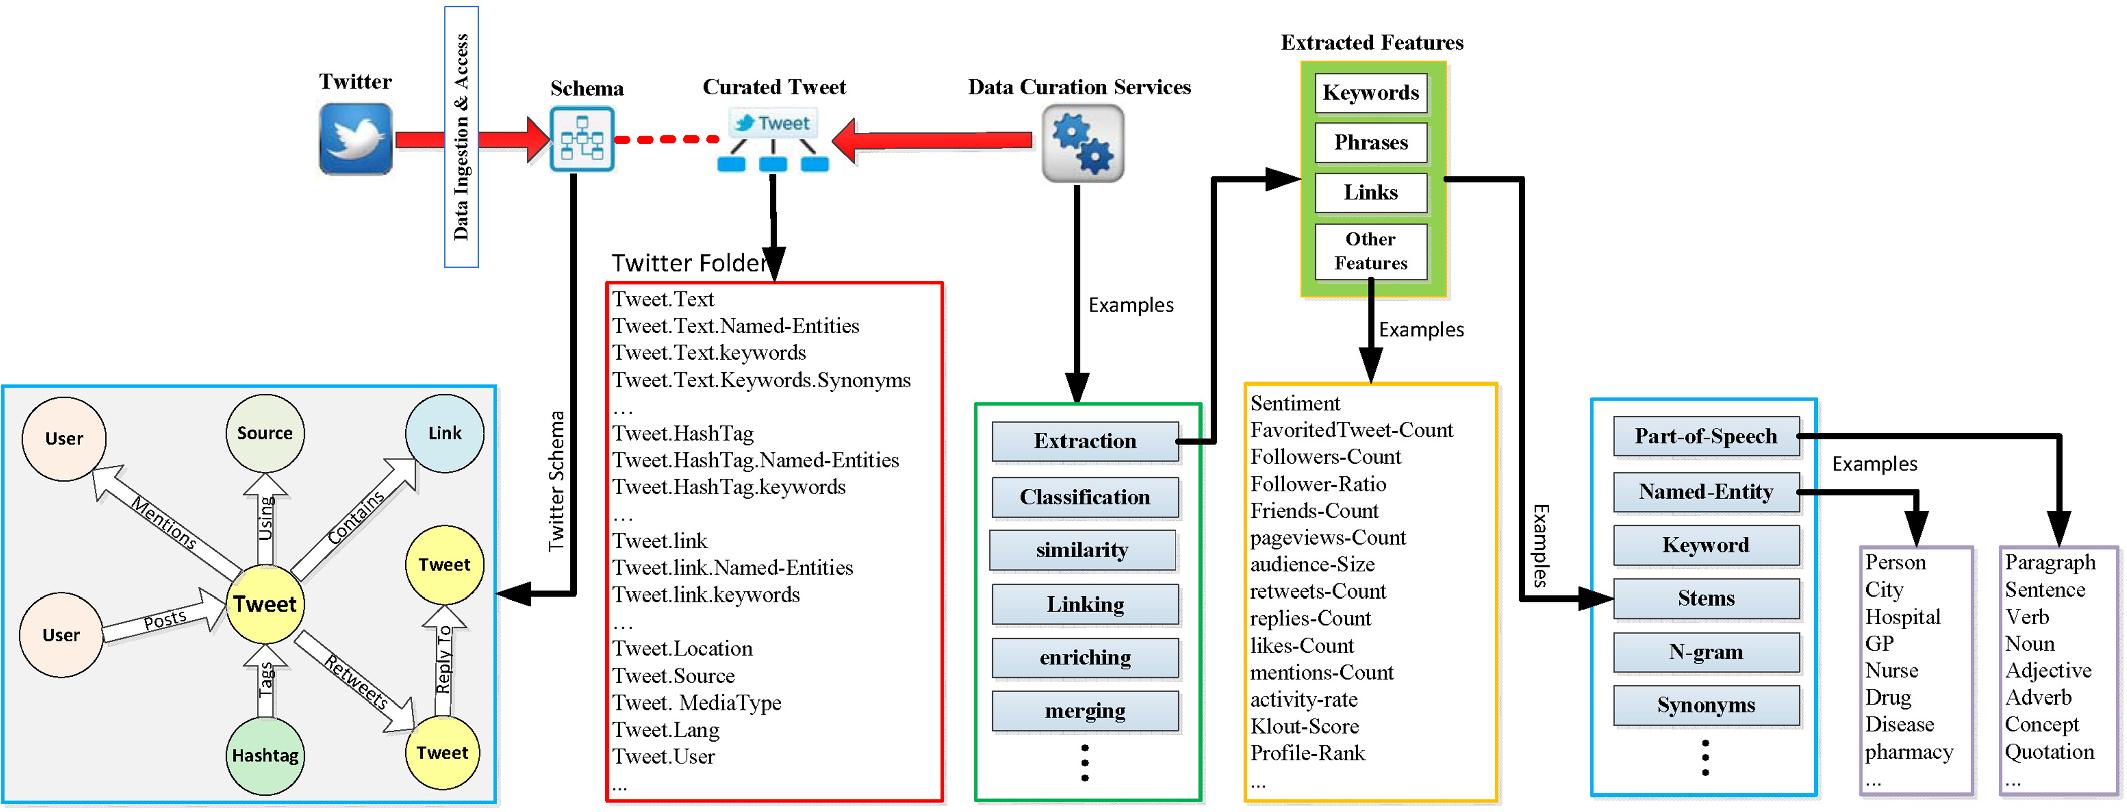 DataSynapse: A Social Data Curation Foundry | SpringerLink